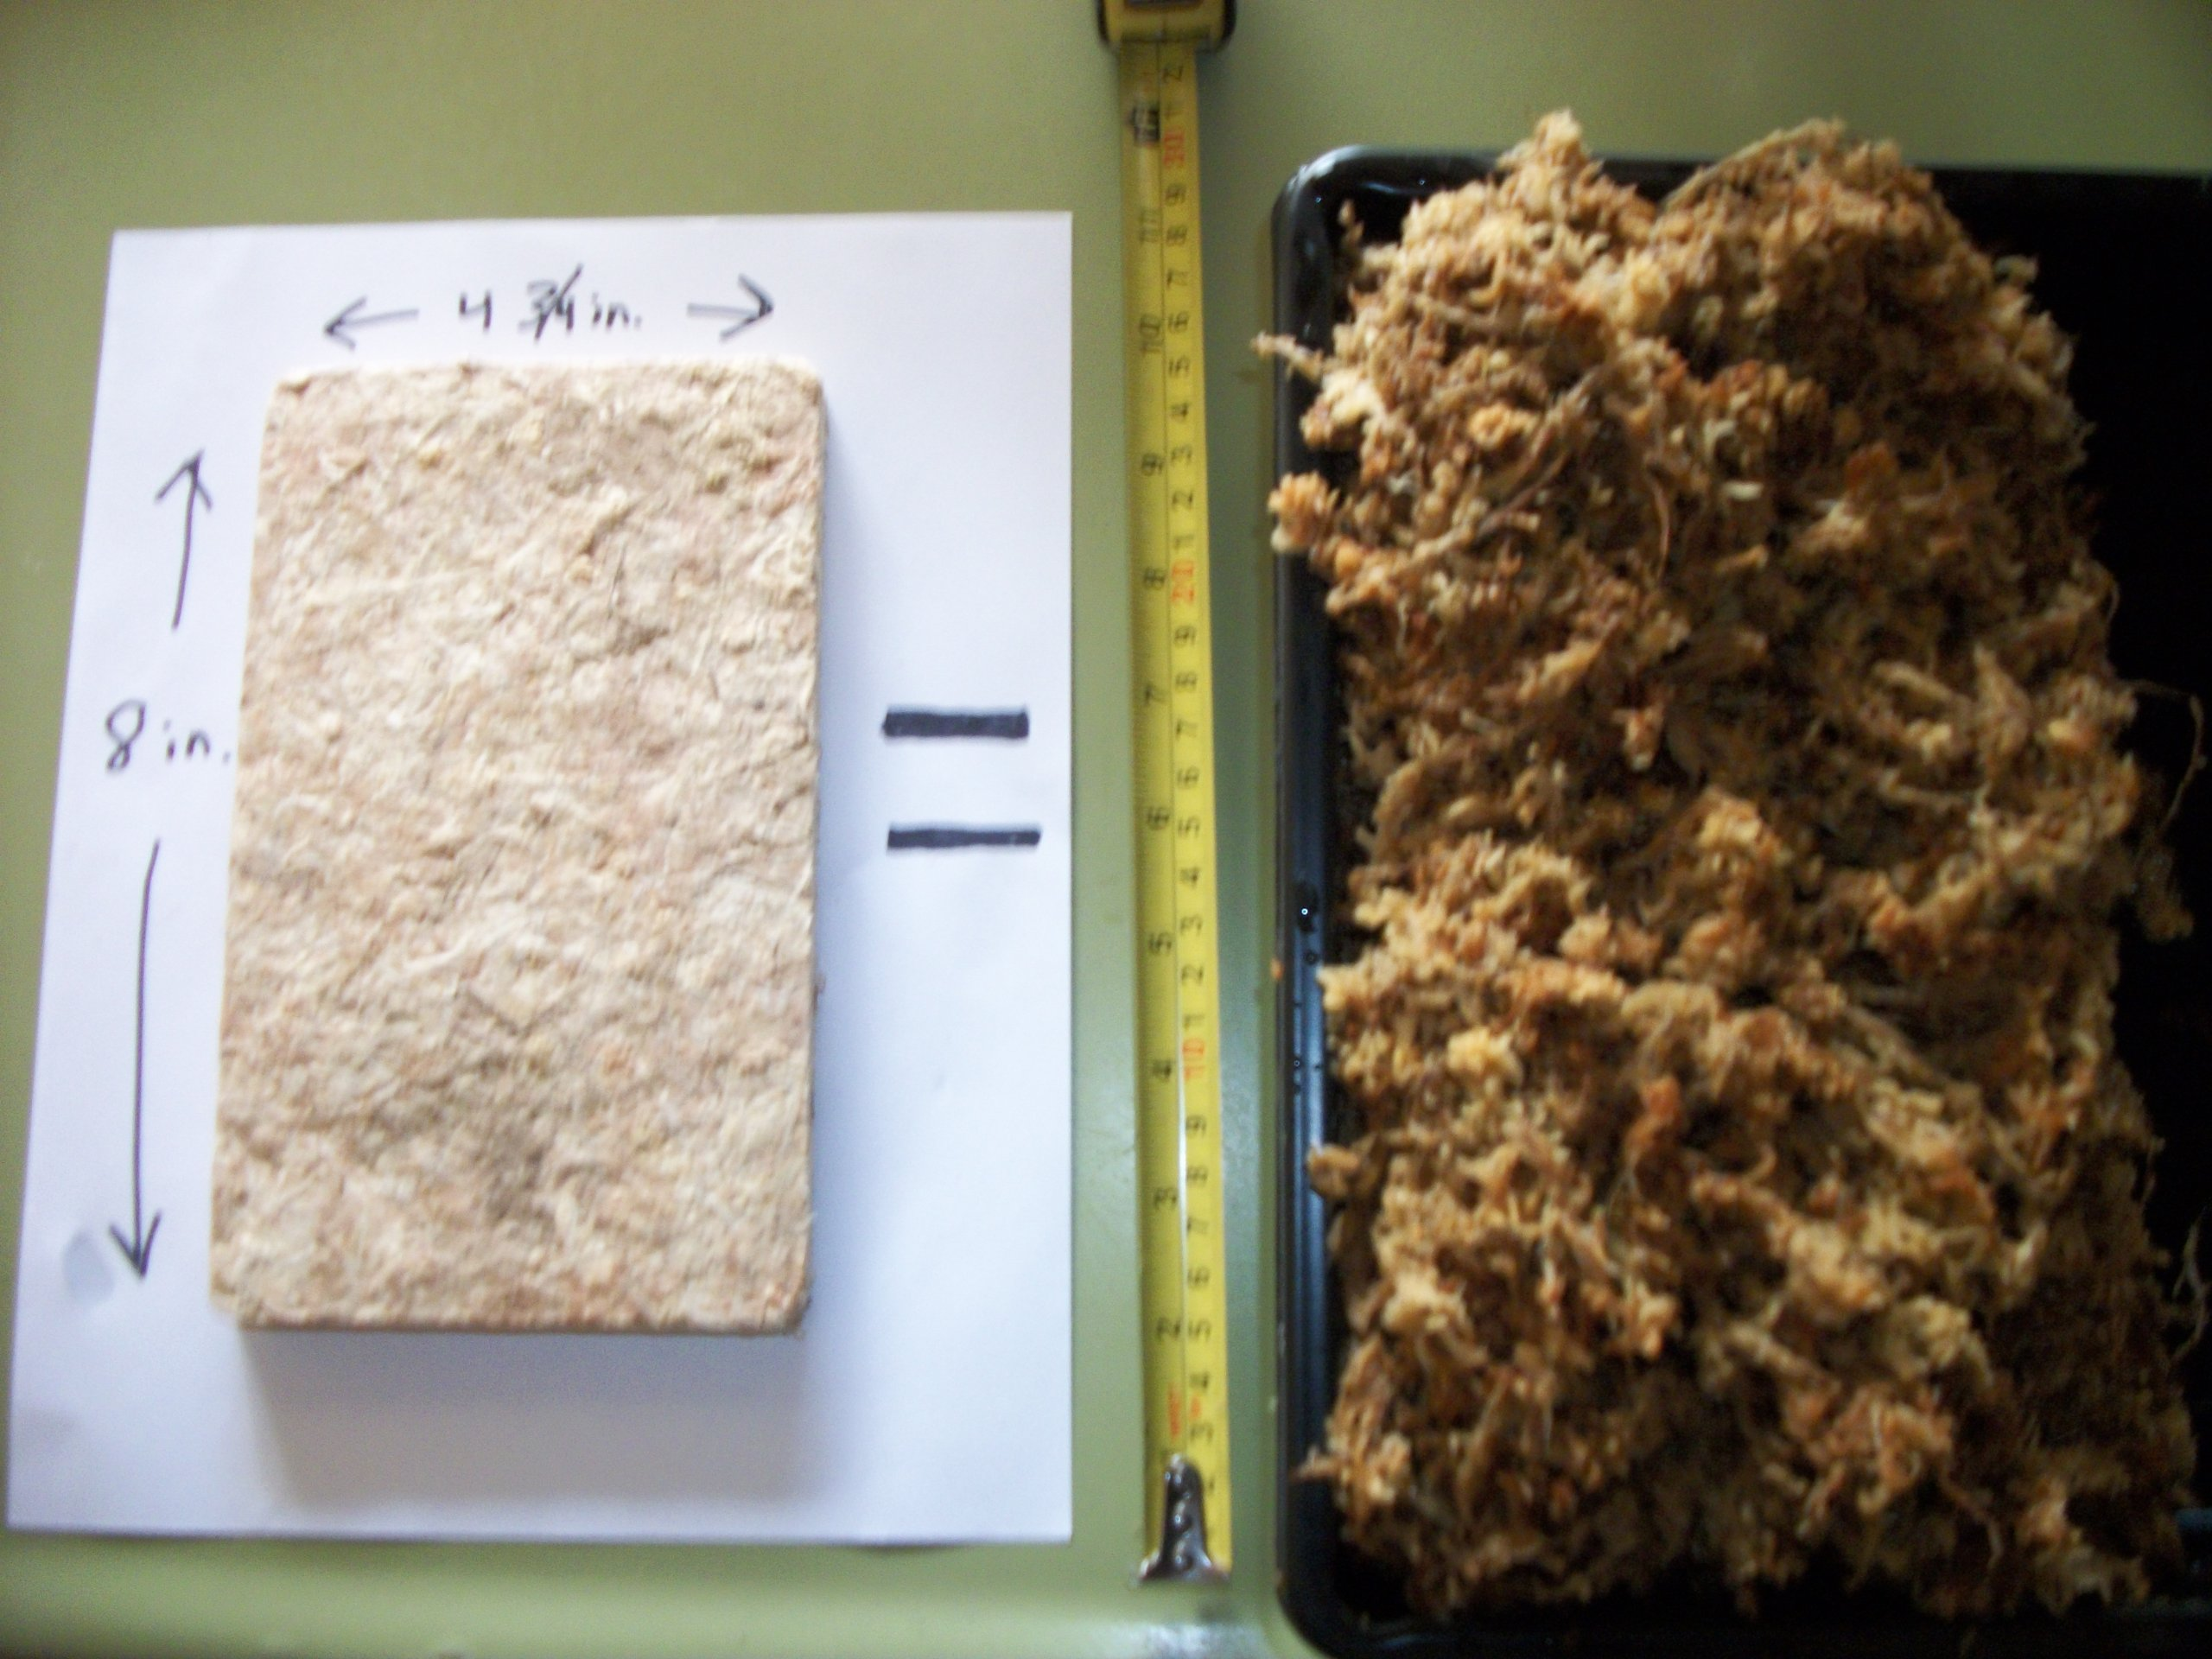 3.2 oz of Super Compressed New Zealand Sphagnum Moss